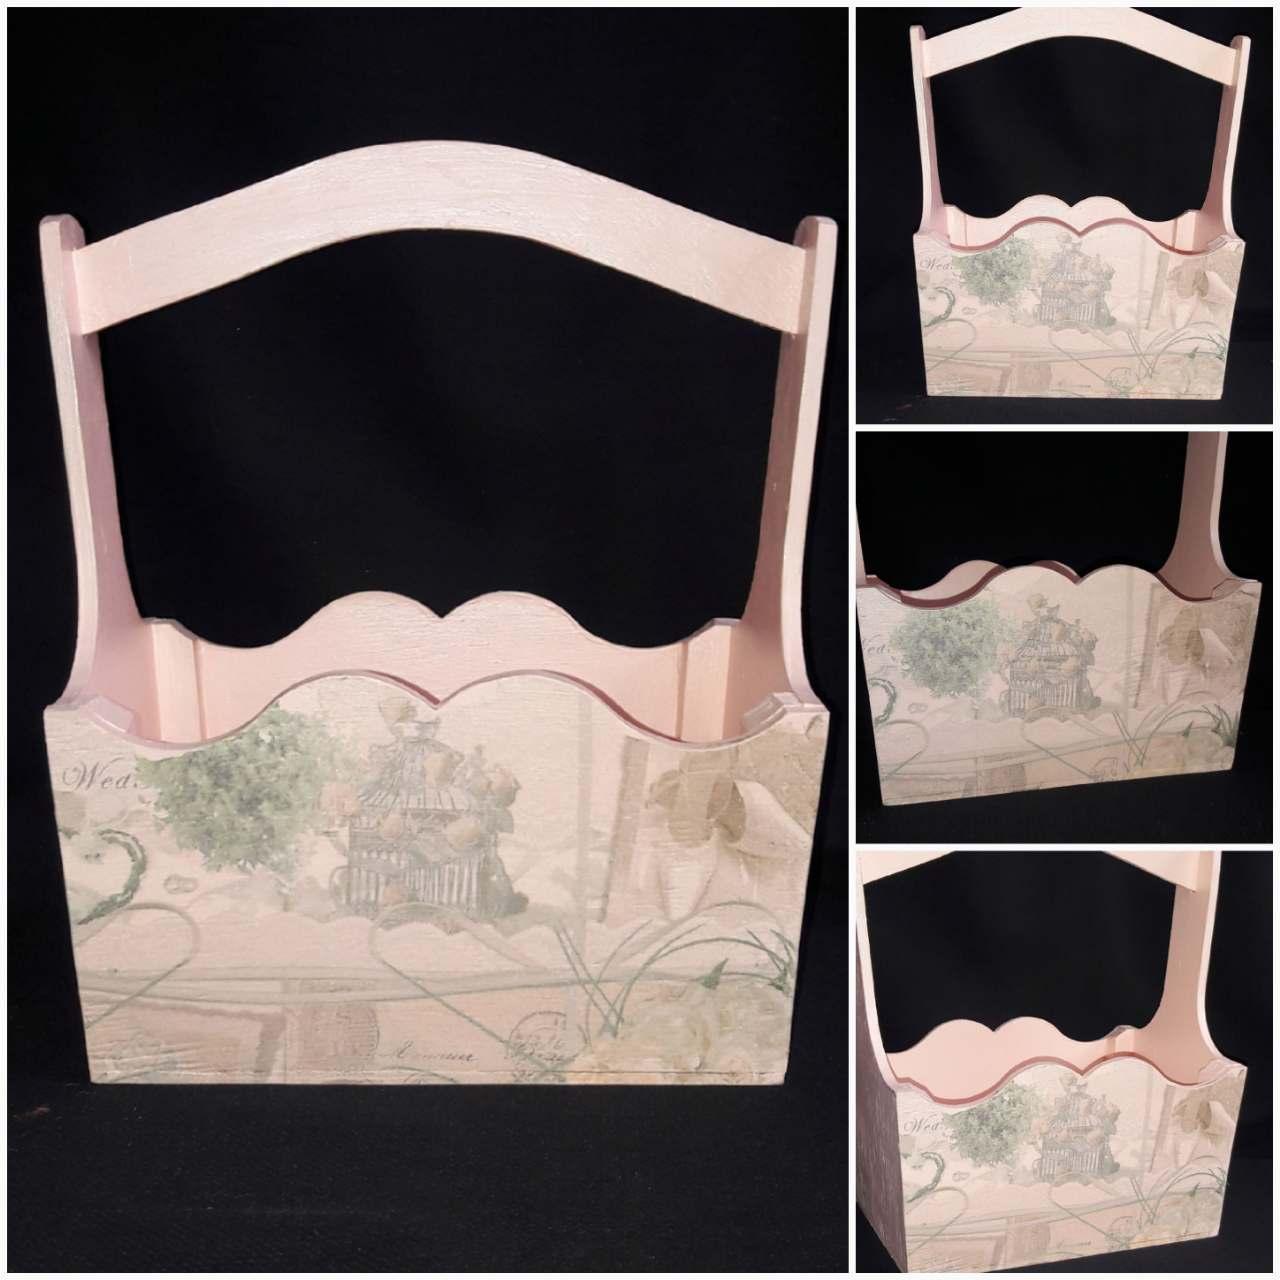 Ящик деревянный ручной работы, стиль - Прованс, техника декупаж, 22х16х28 см, 280/250 (цена за 1 шт. + 30 гр.)